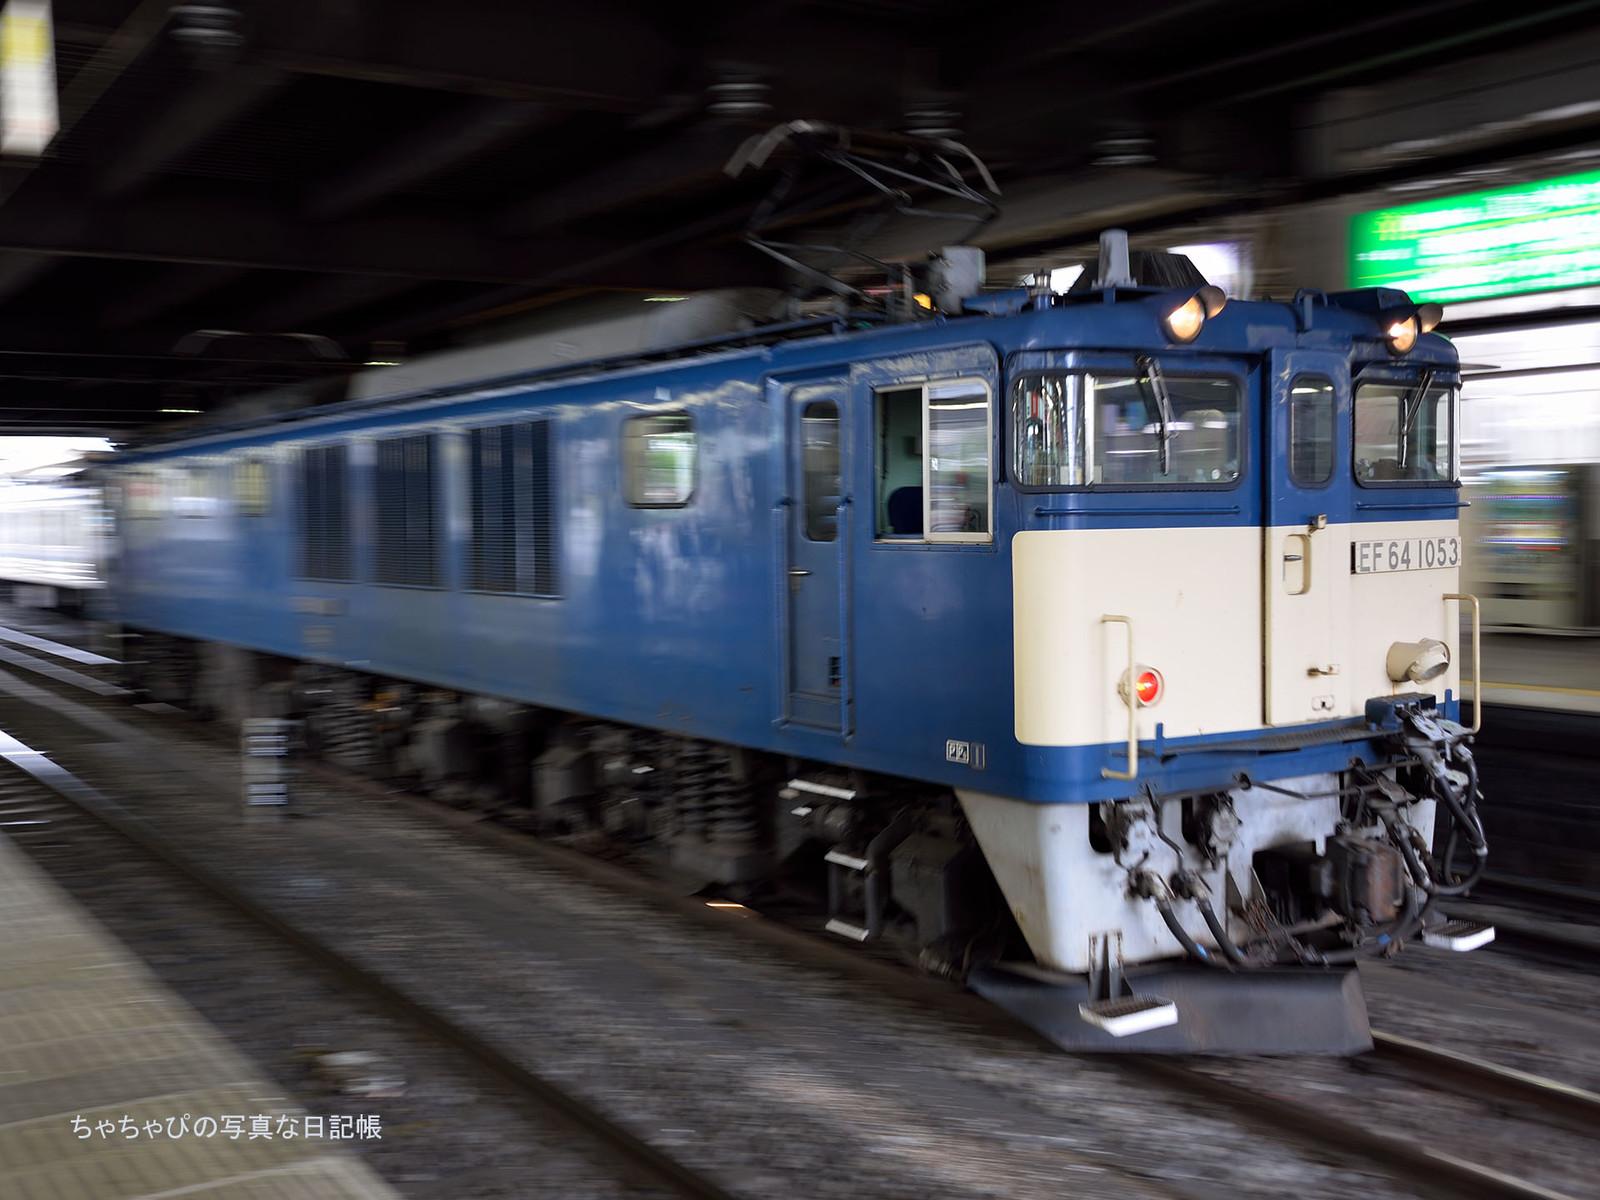 Ef641053